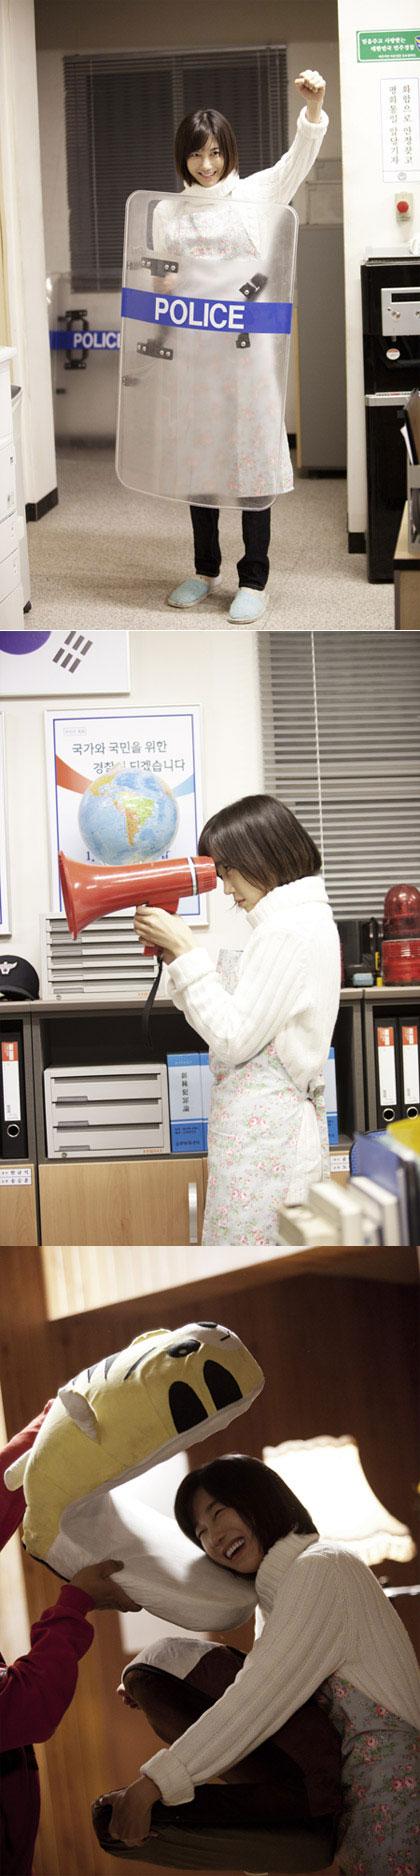 Funny Lee Ji Ah